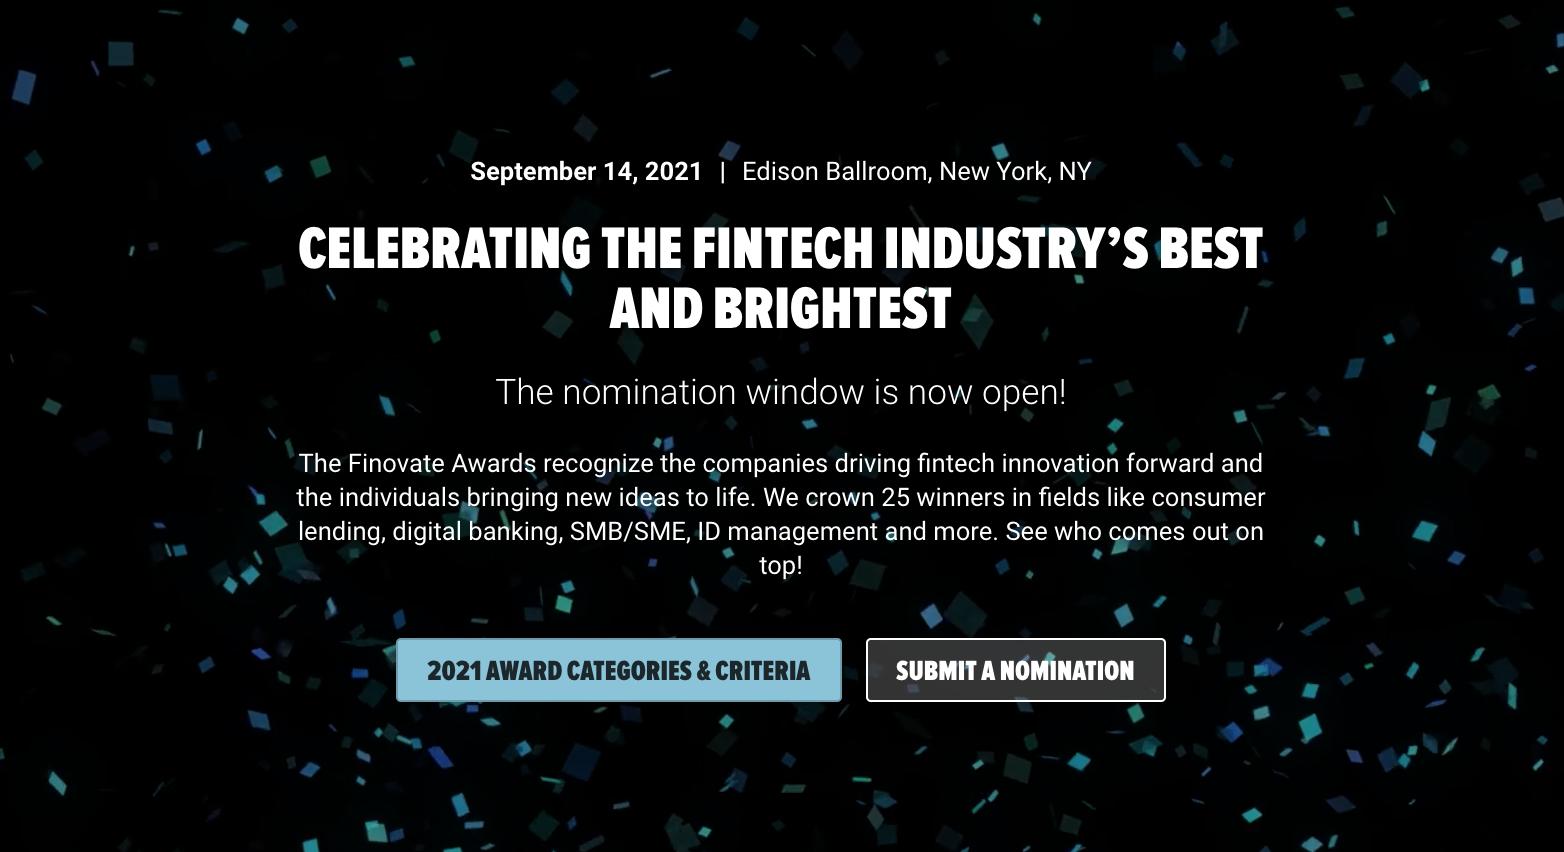 Finovate Awards 2021